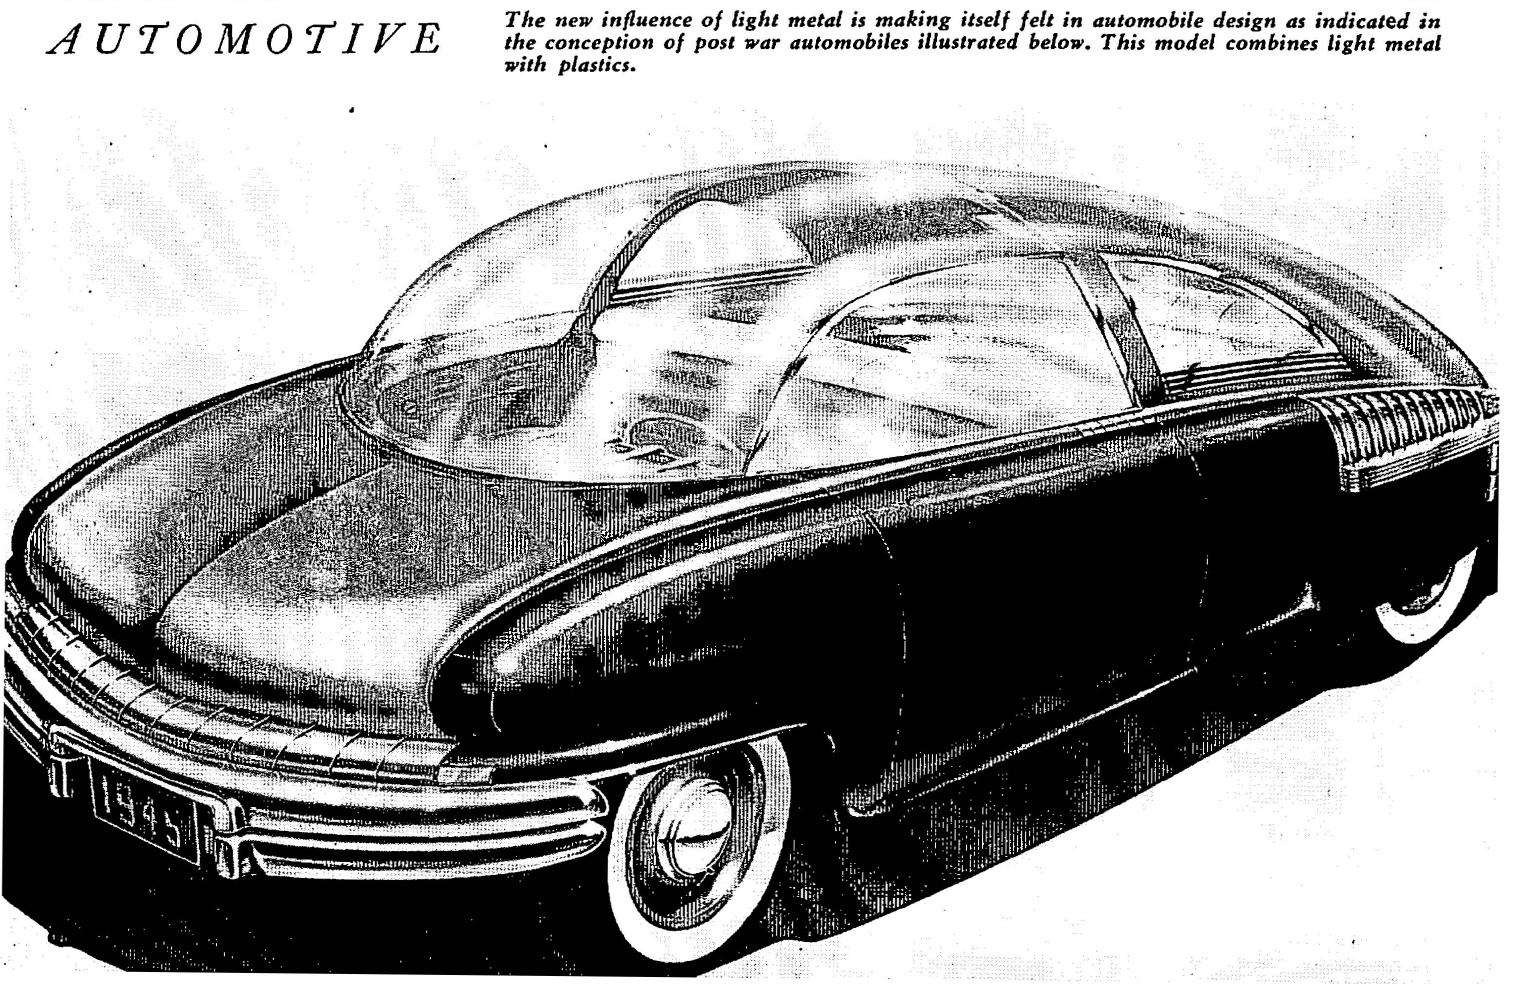 Light Metal Age, May 1943